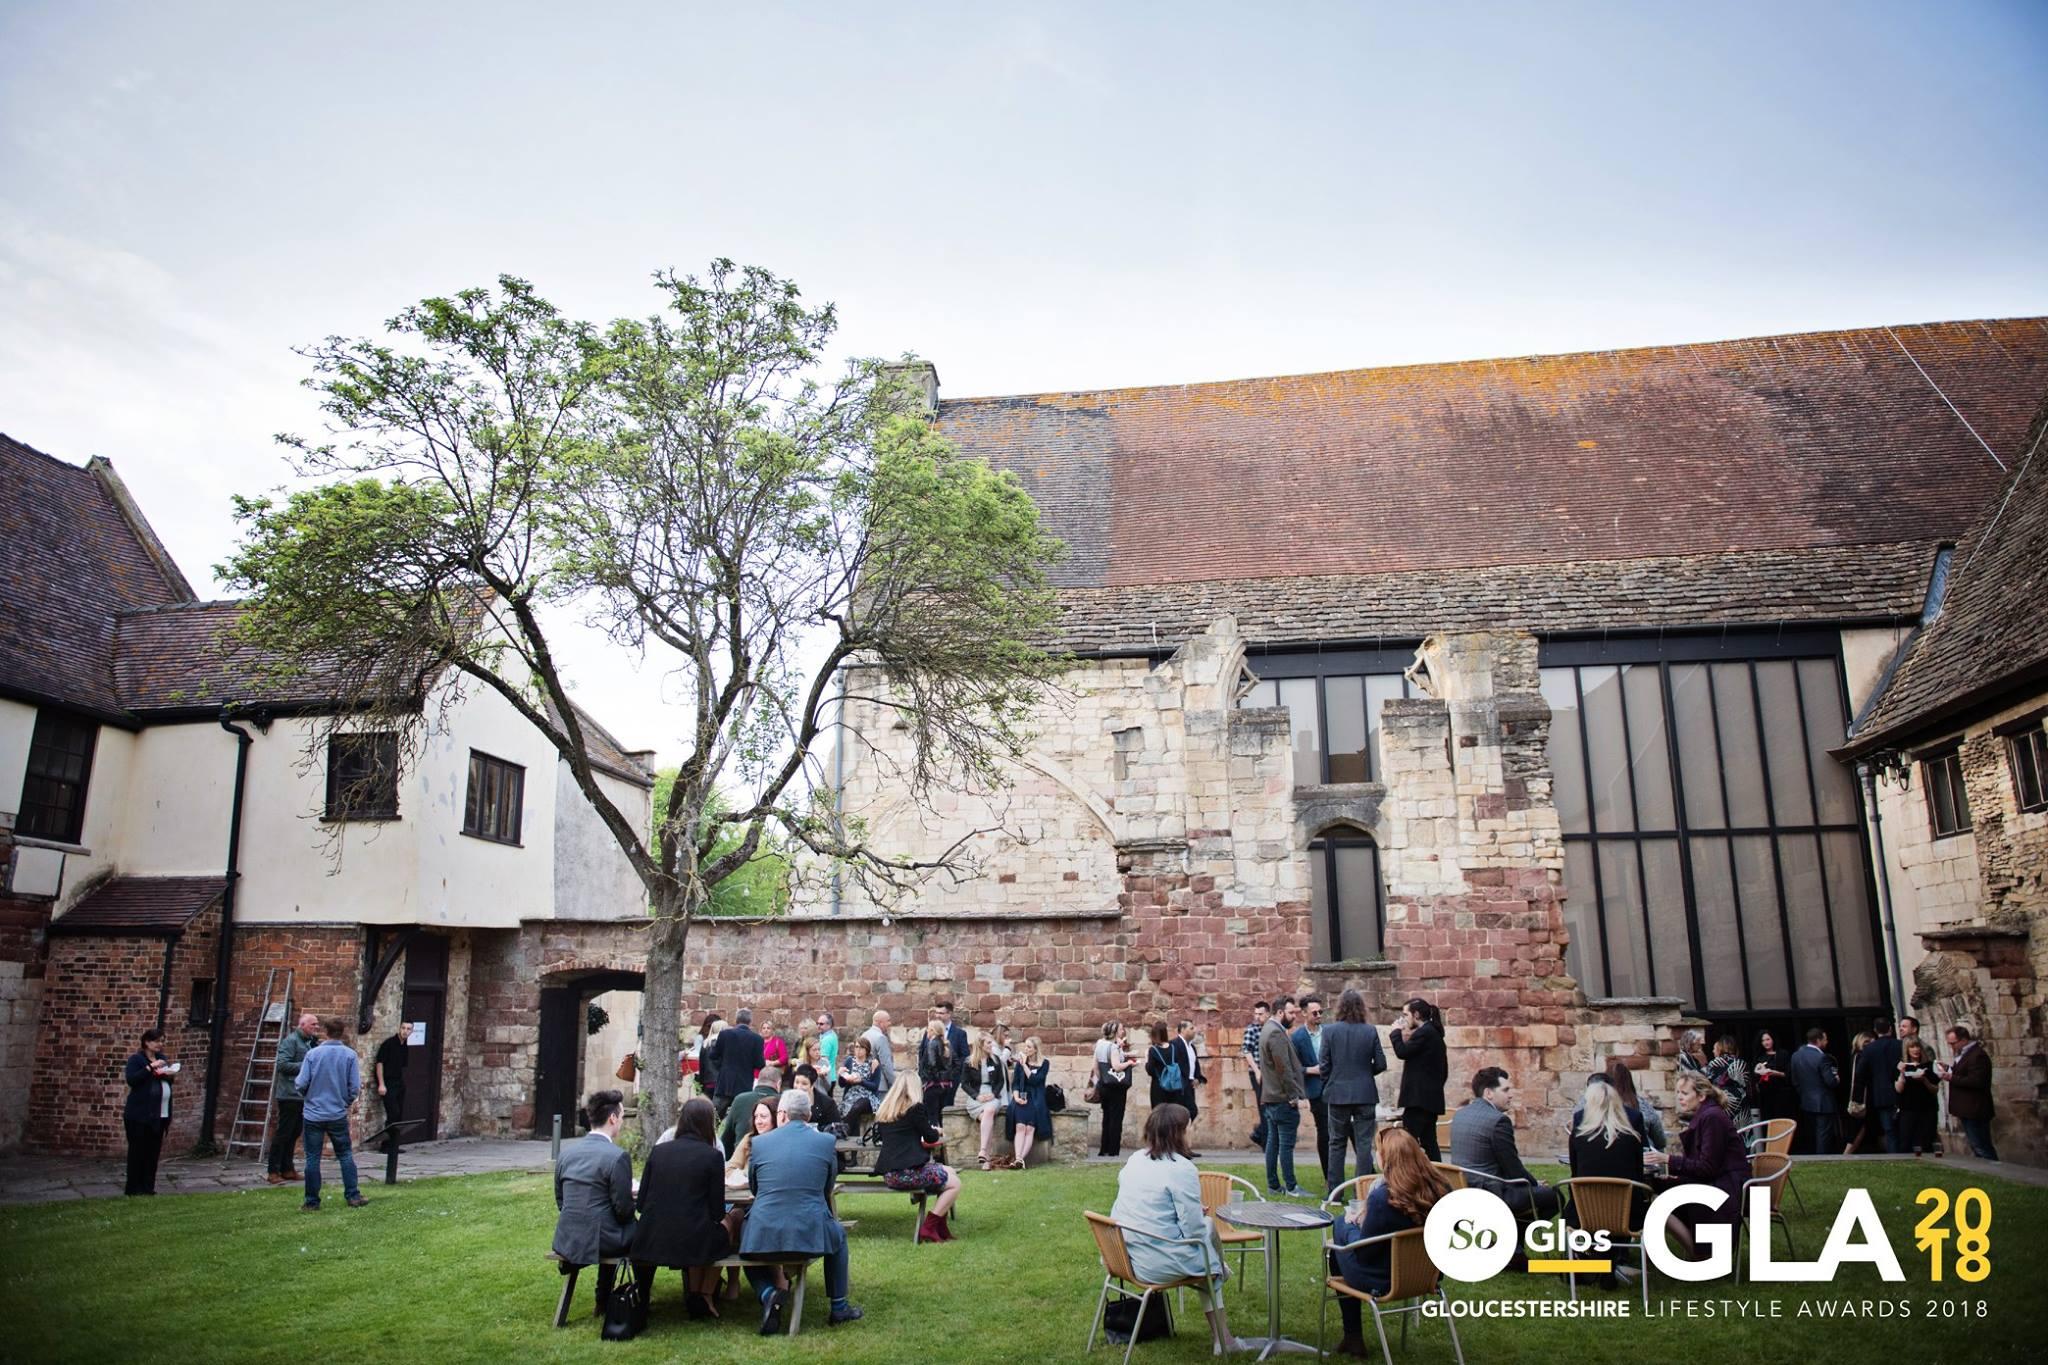 Blackfriars Priory event venue